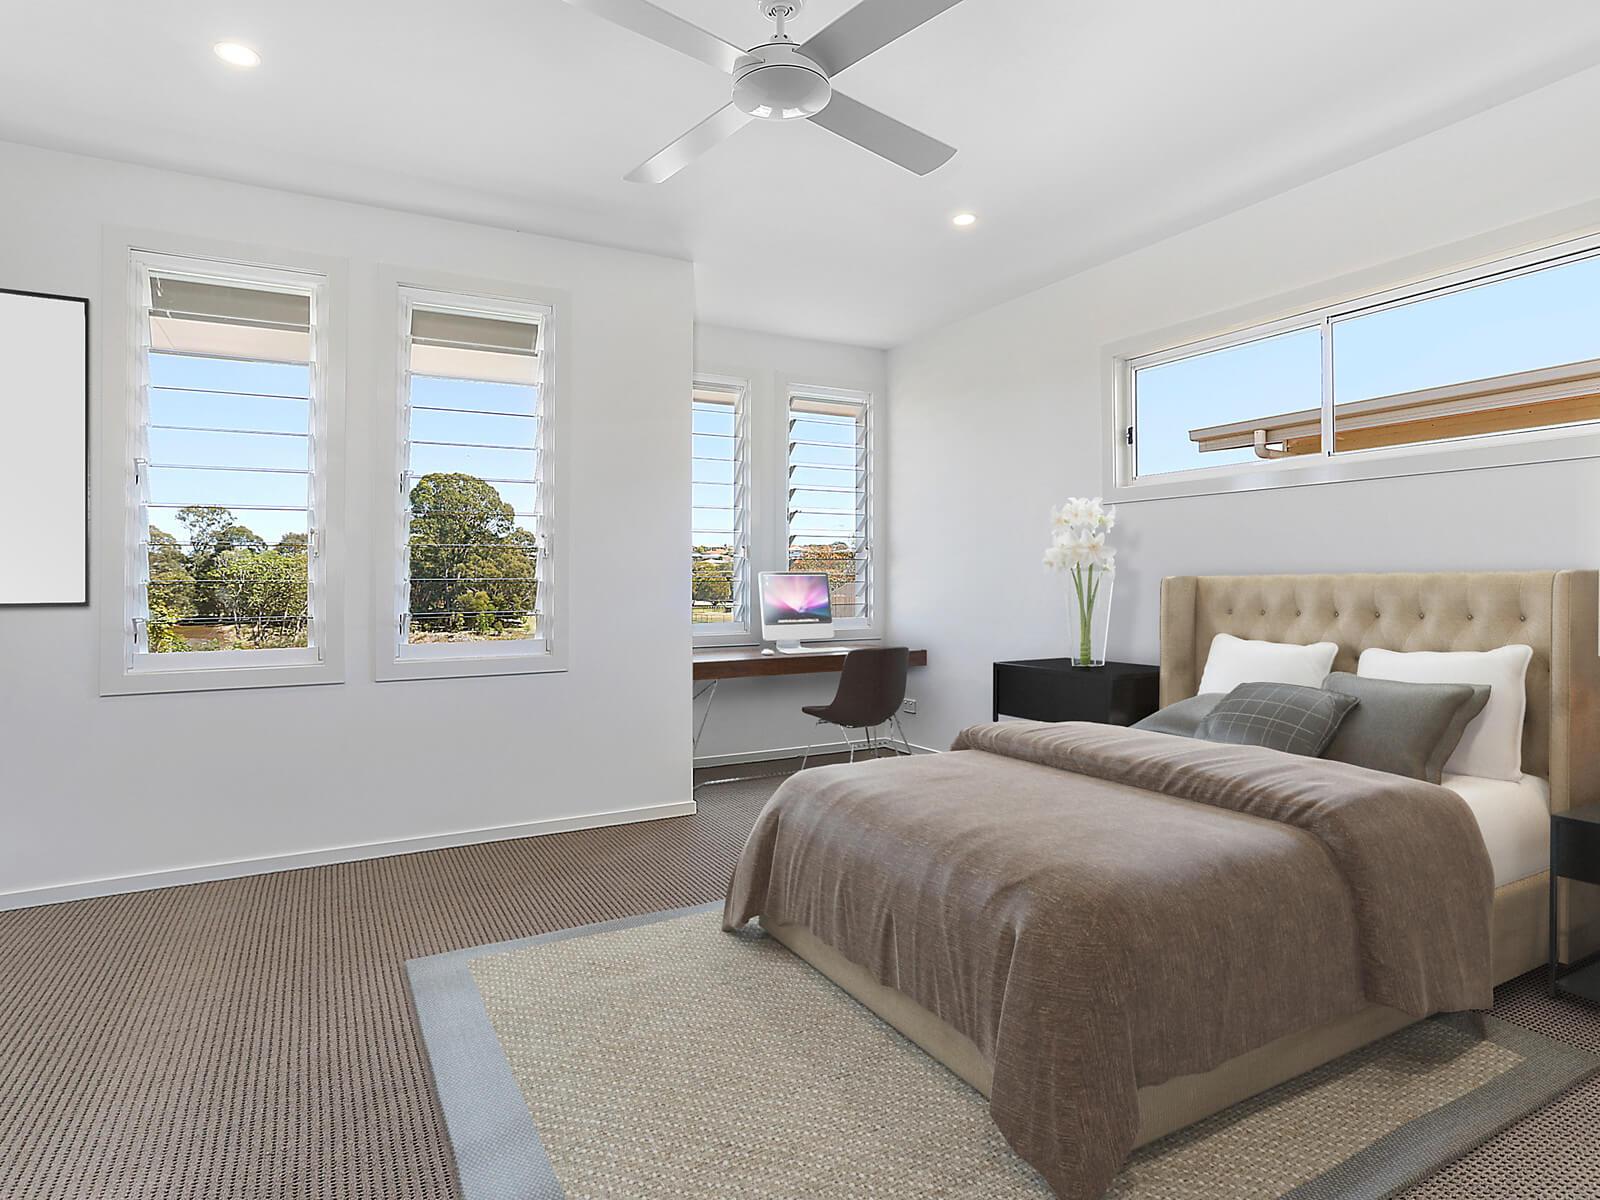 Planning for a Bedroom Renovation